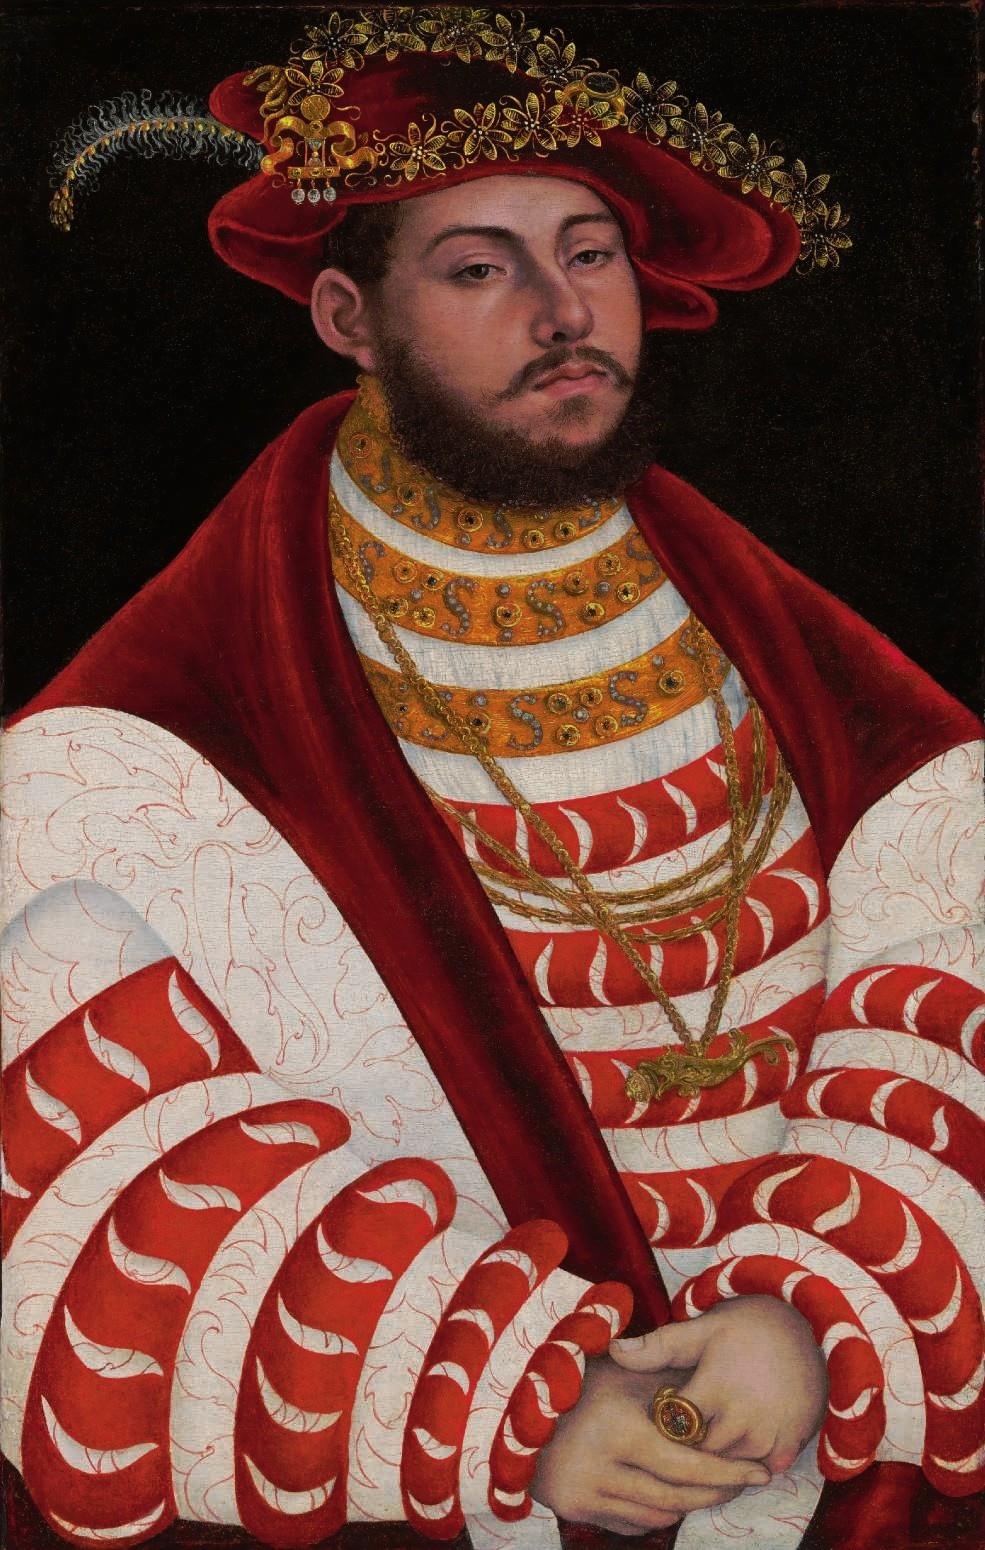 Lucas Cranach I (1472-1553) Portrait of John Frederick I